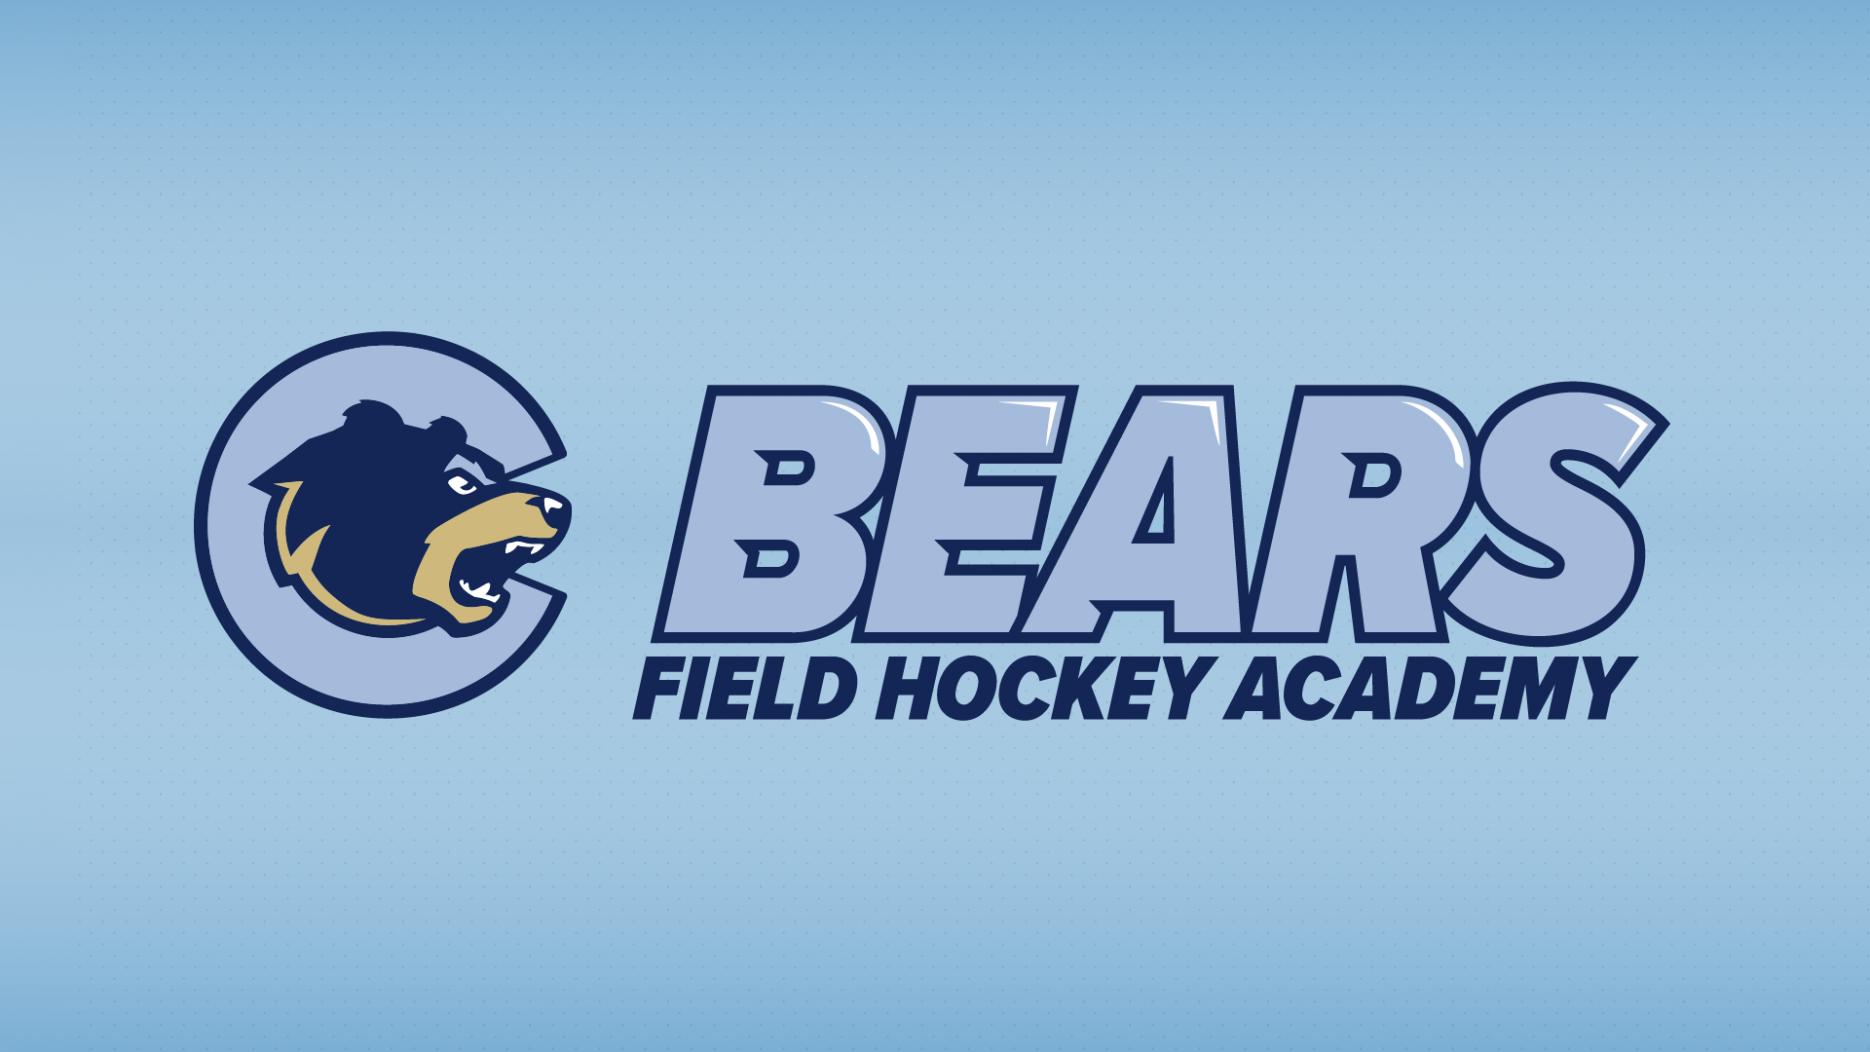 Colorado Bears Field Hockey Academy